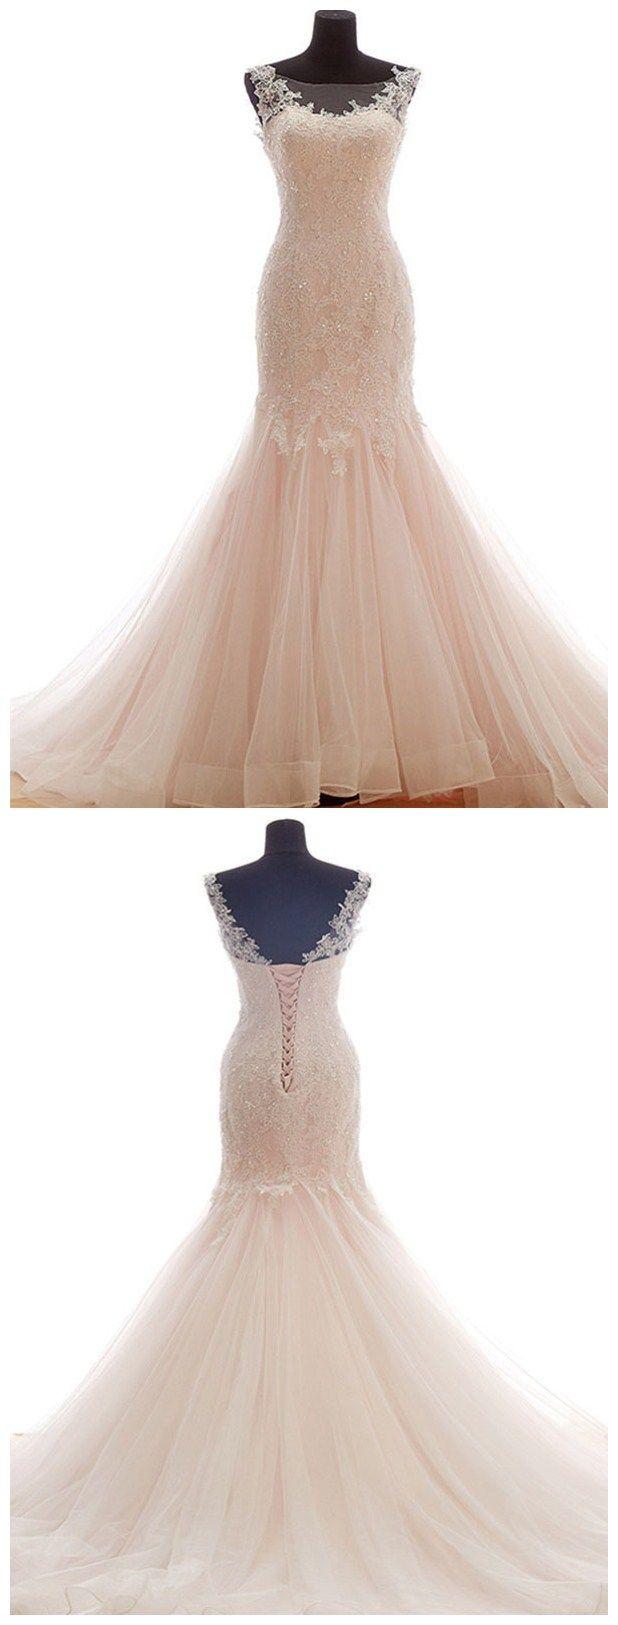 Blush mermaid wedding dress  Eyecatching Tulle Bateau Neckline Mermaid Wedding Dresses With